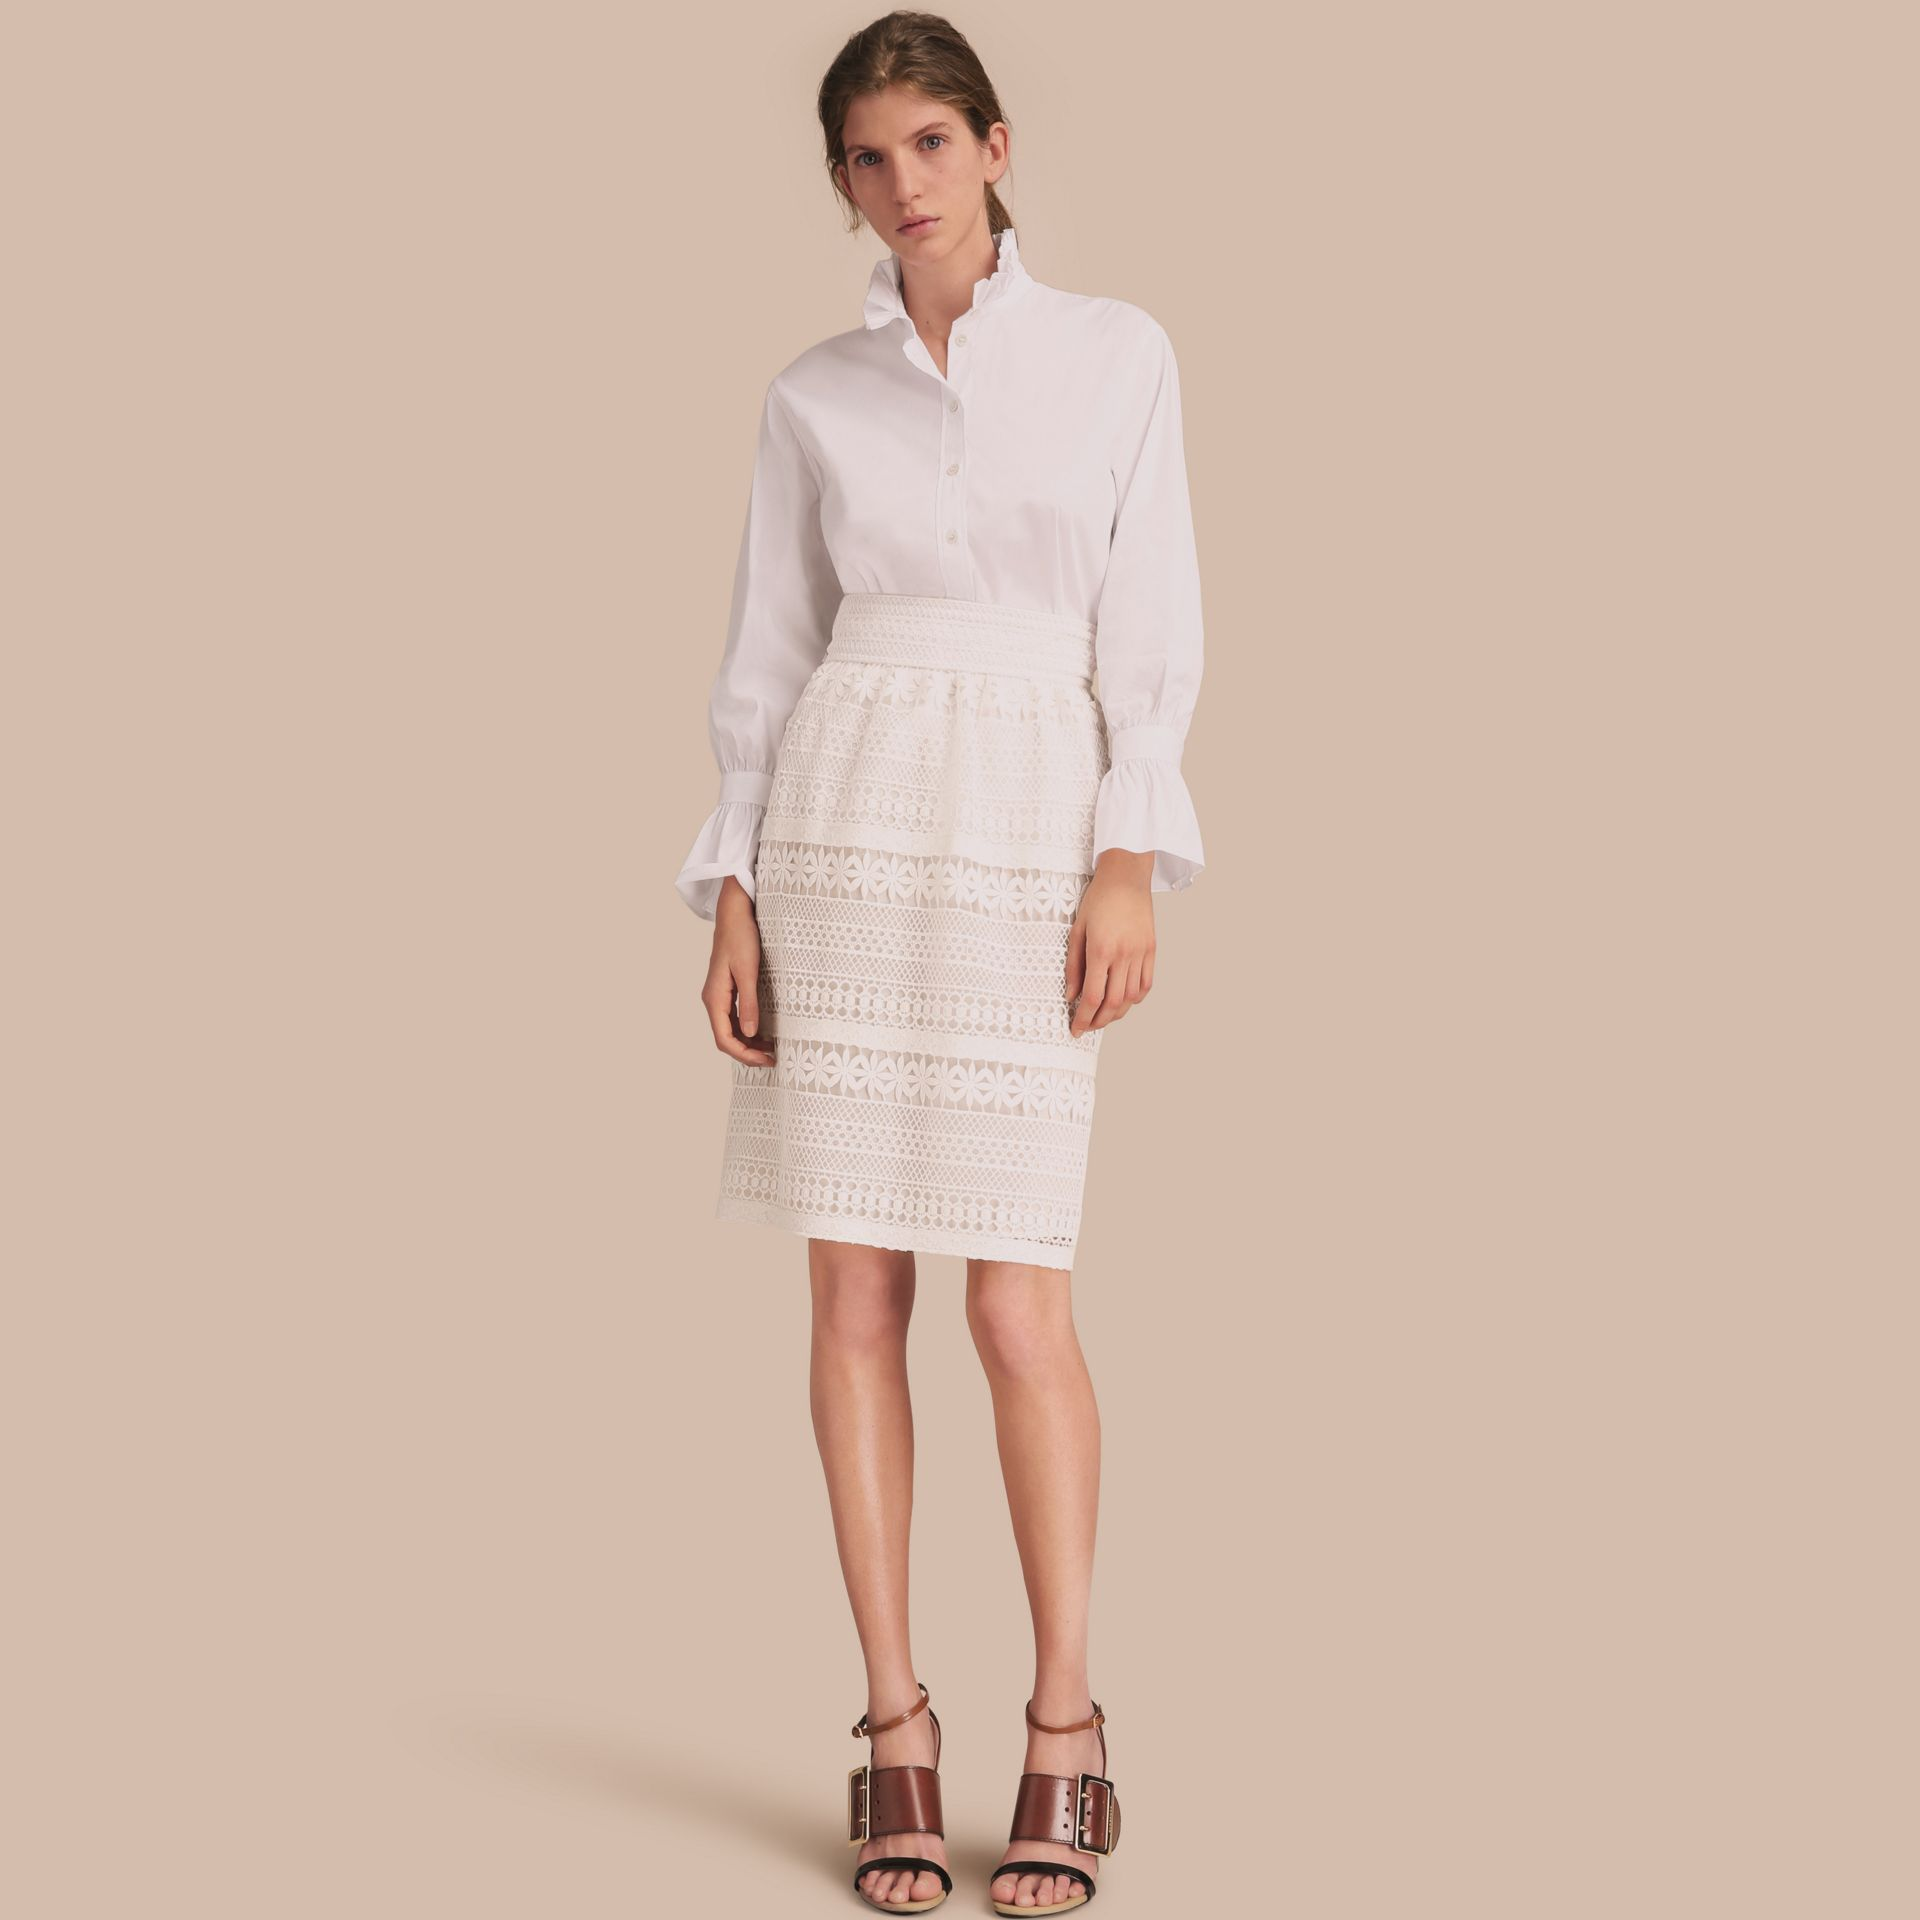 White Ruffle Detail Stretch Cotton Poplin Shirt - gallery image 1